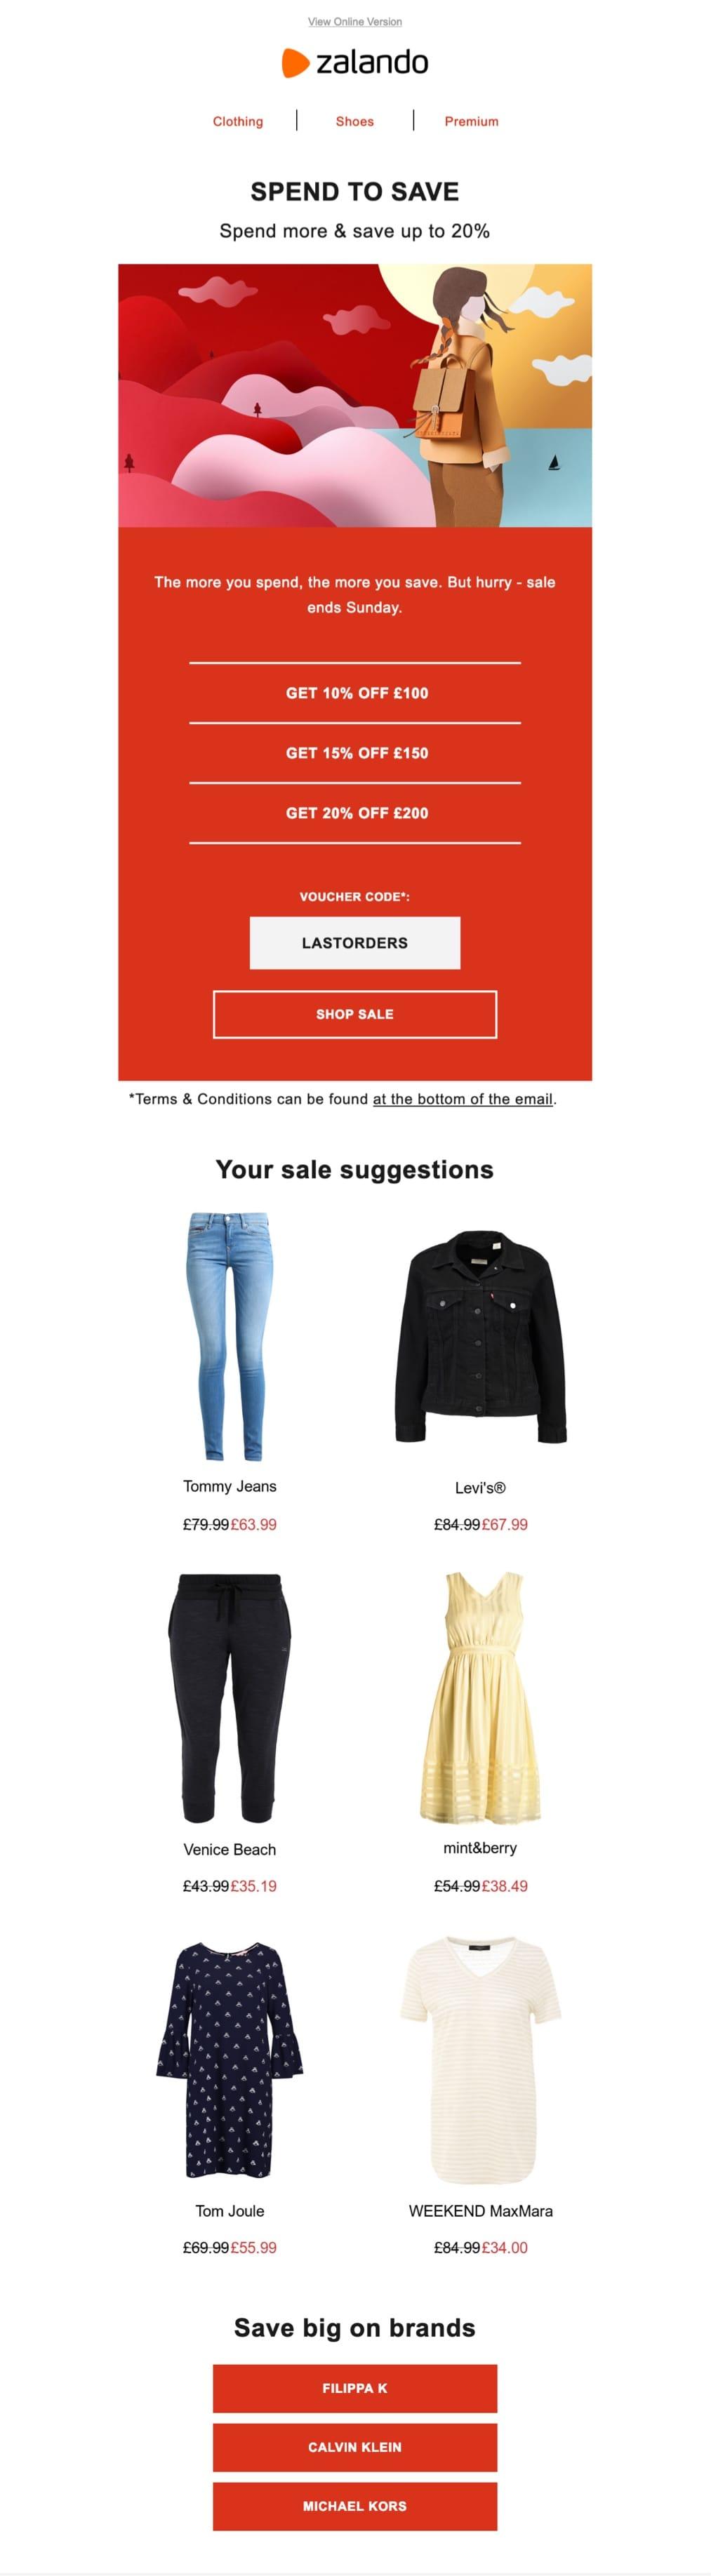 promotional email example zalando (sale email)